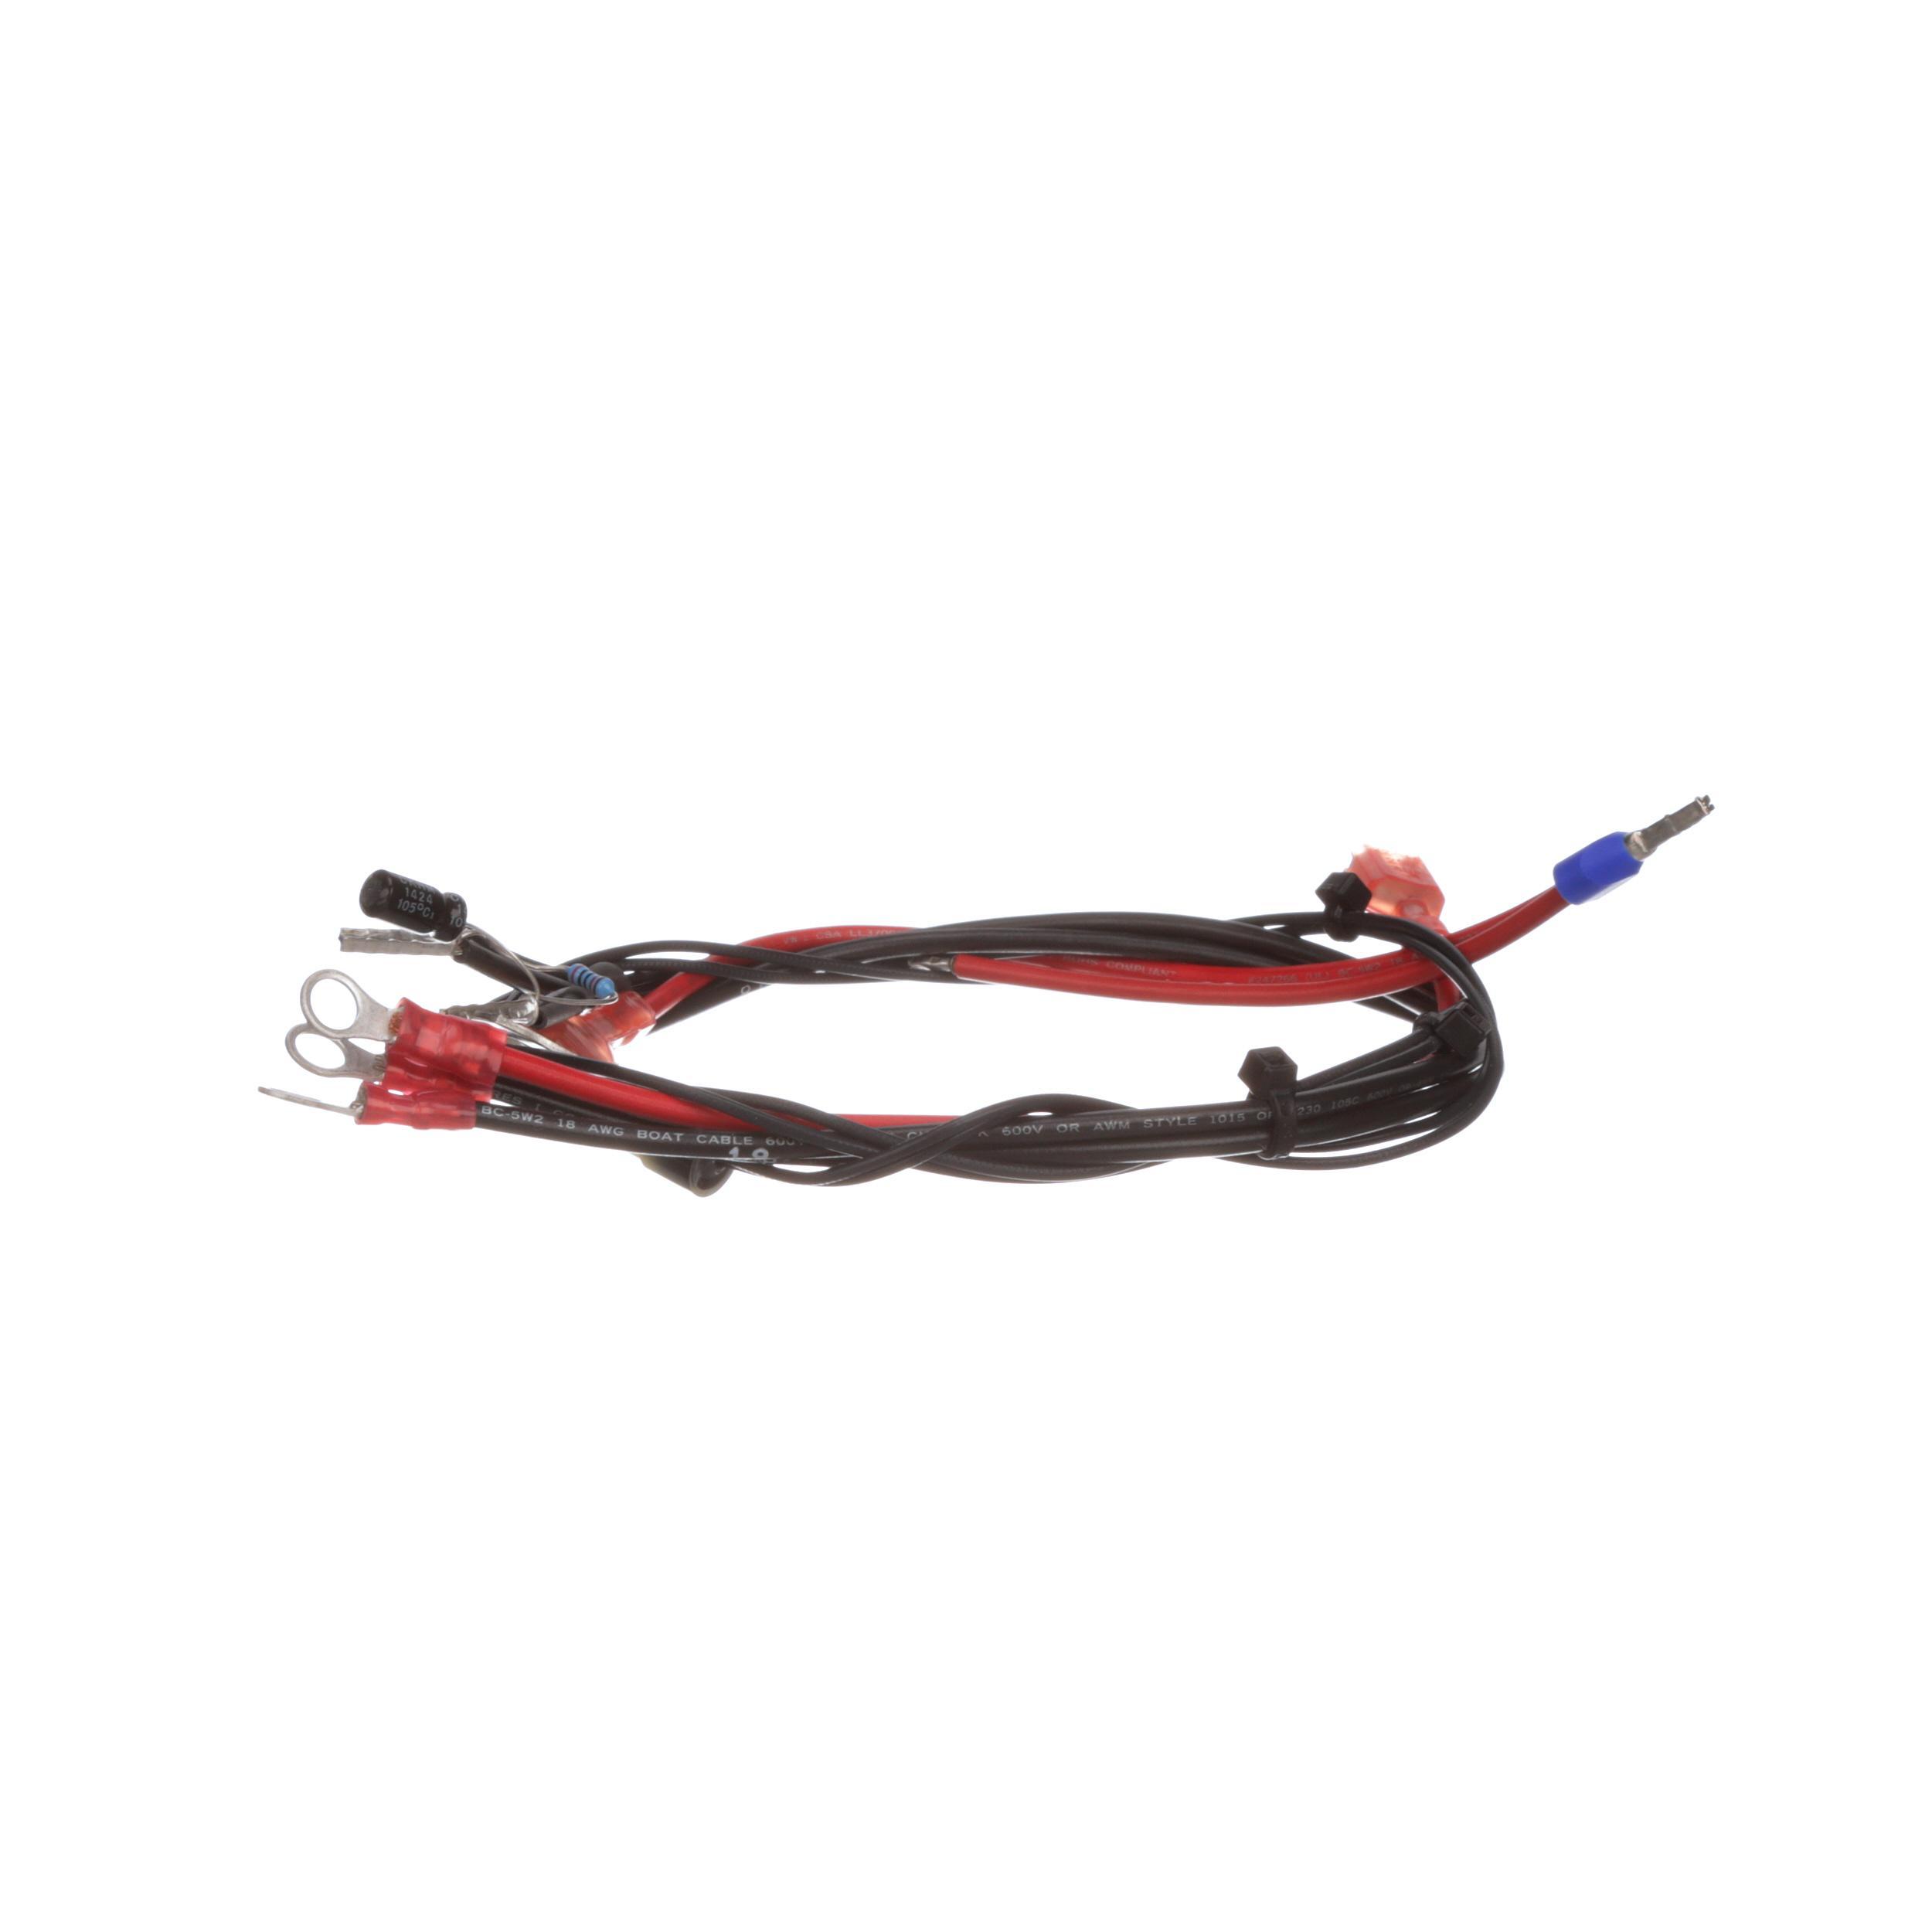 Garland Wire Harness Dc Efw800